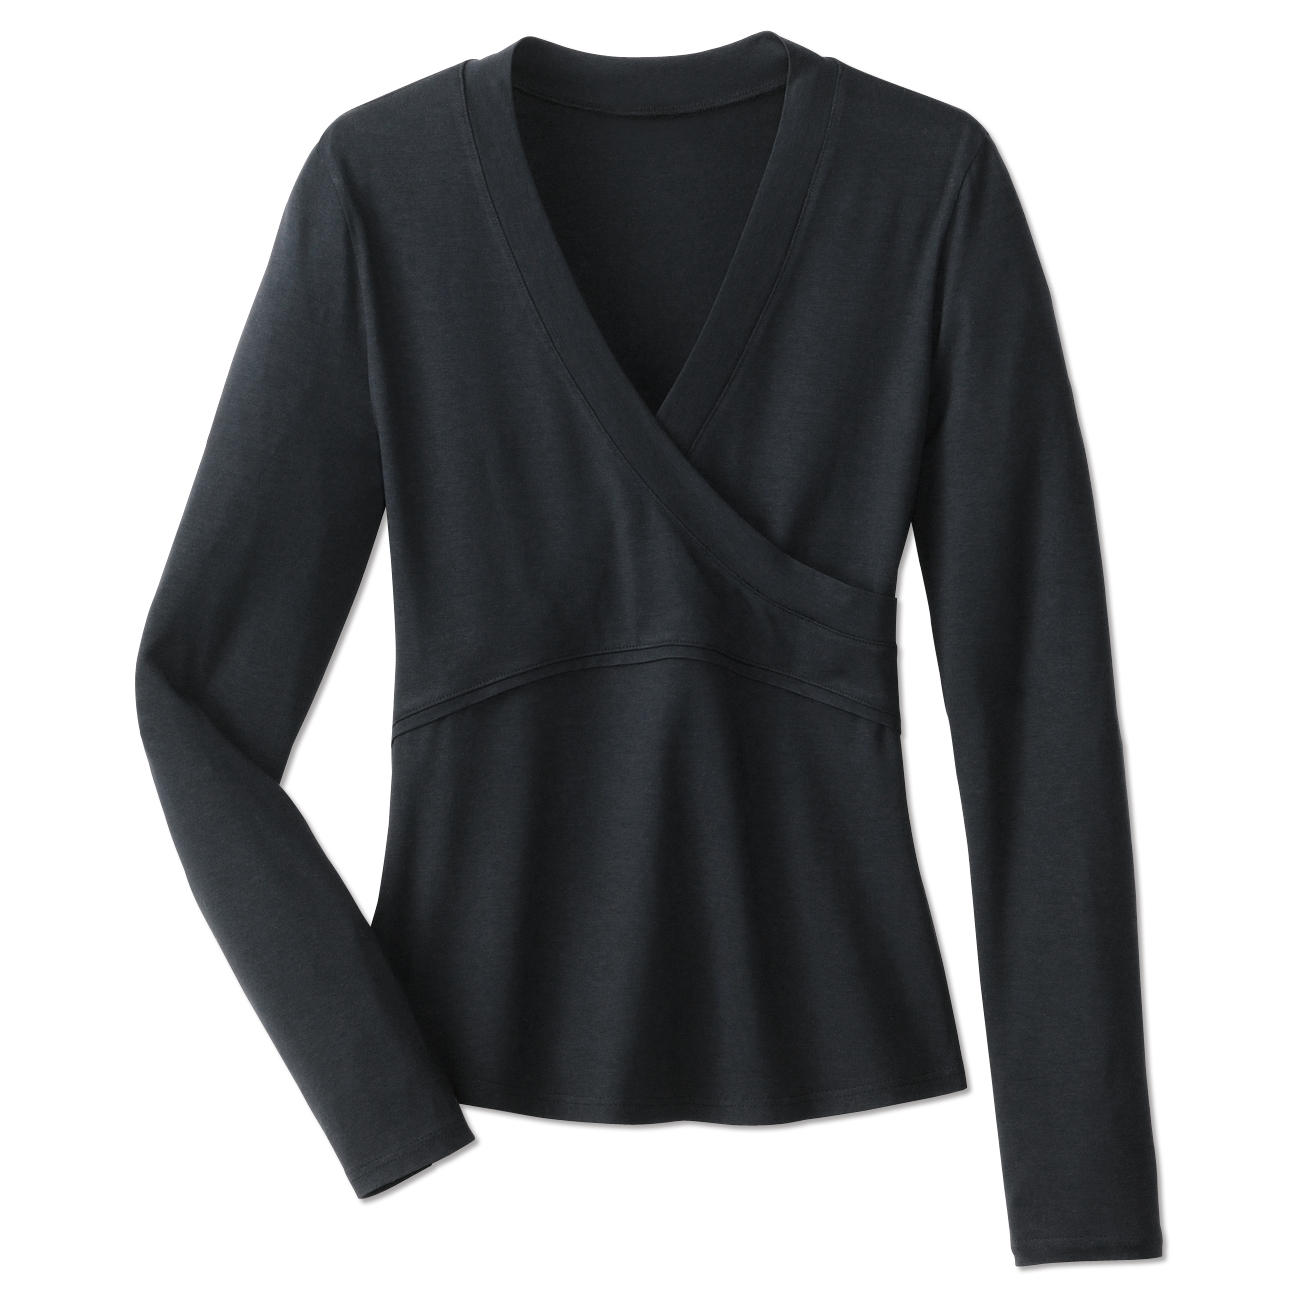 langarm wickel shirt 3 jahre garantie pro idee. Black Bedroom Furniture Sets. Home Design Ideas